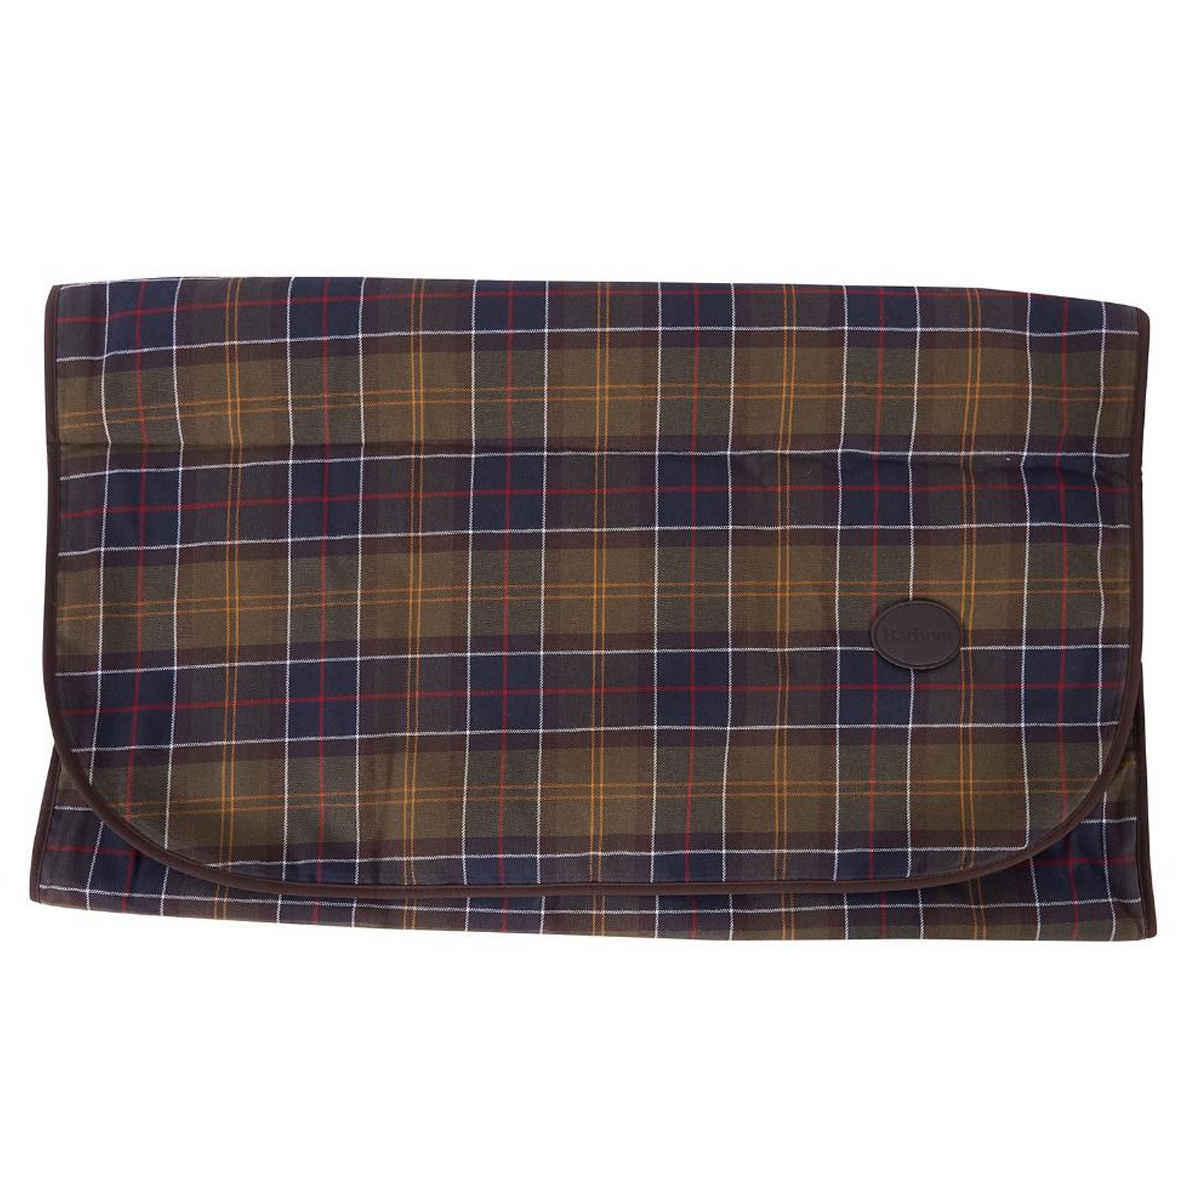 Barbour Medium Dog Blanket – Classic Tartan